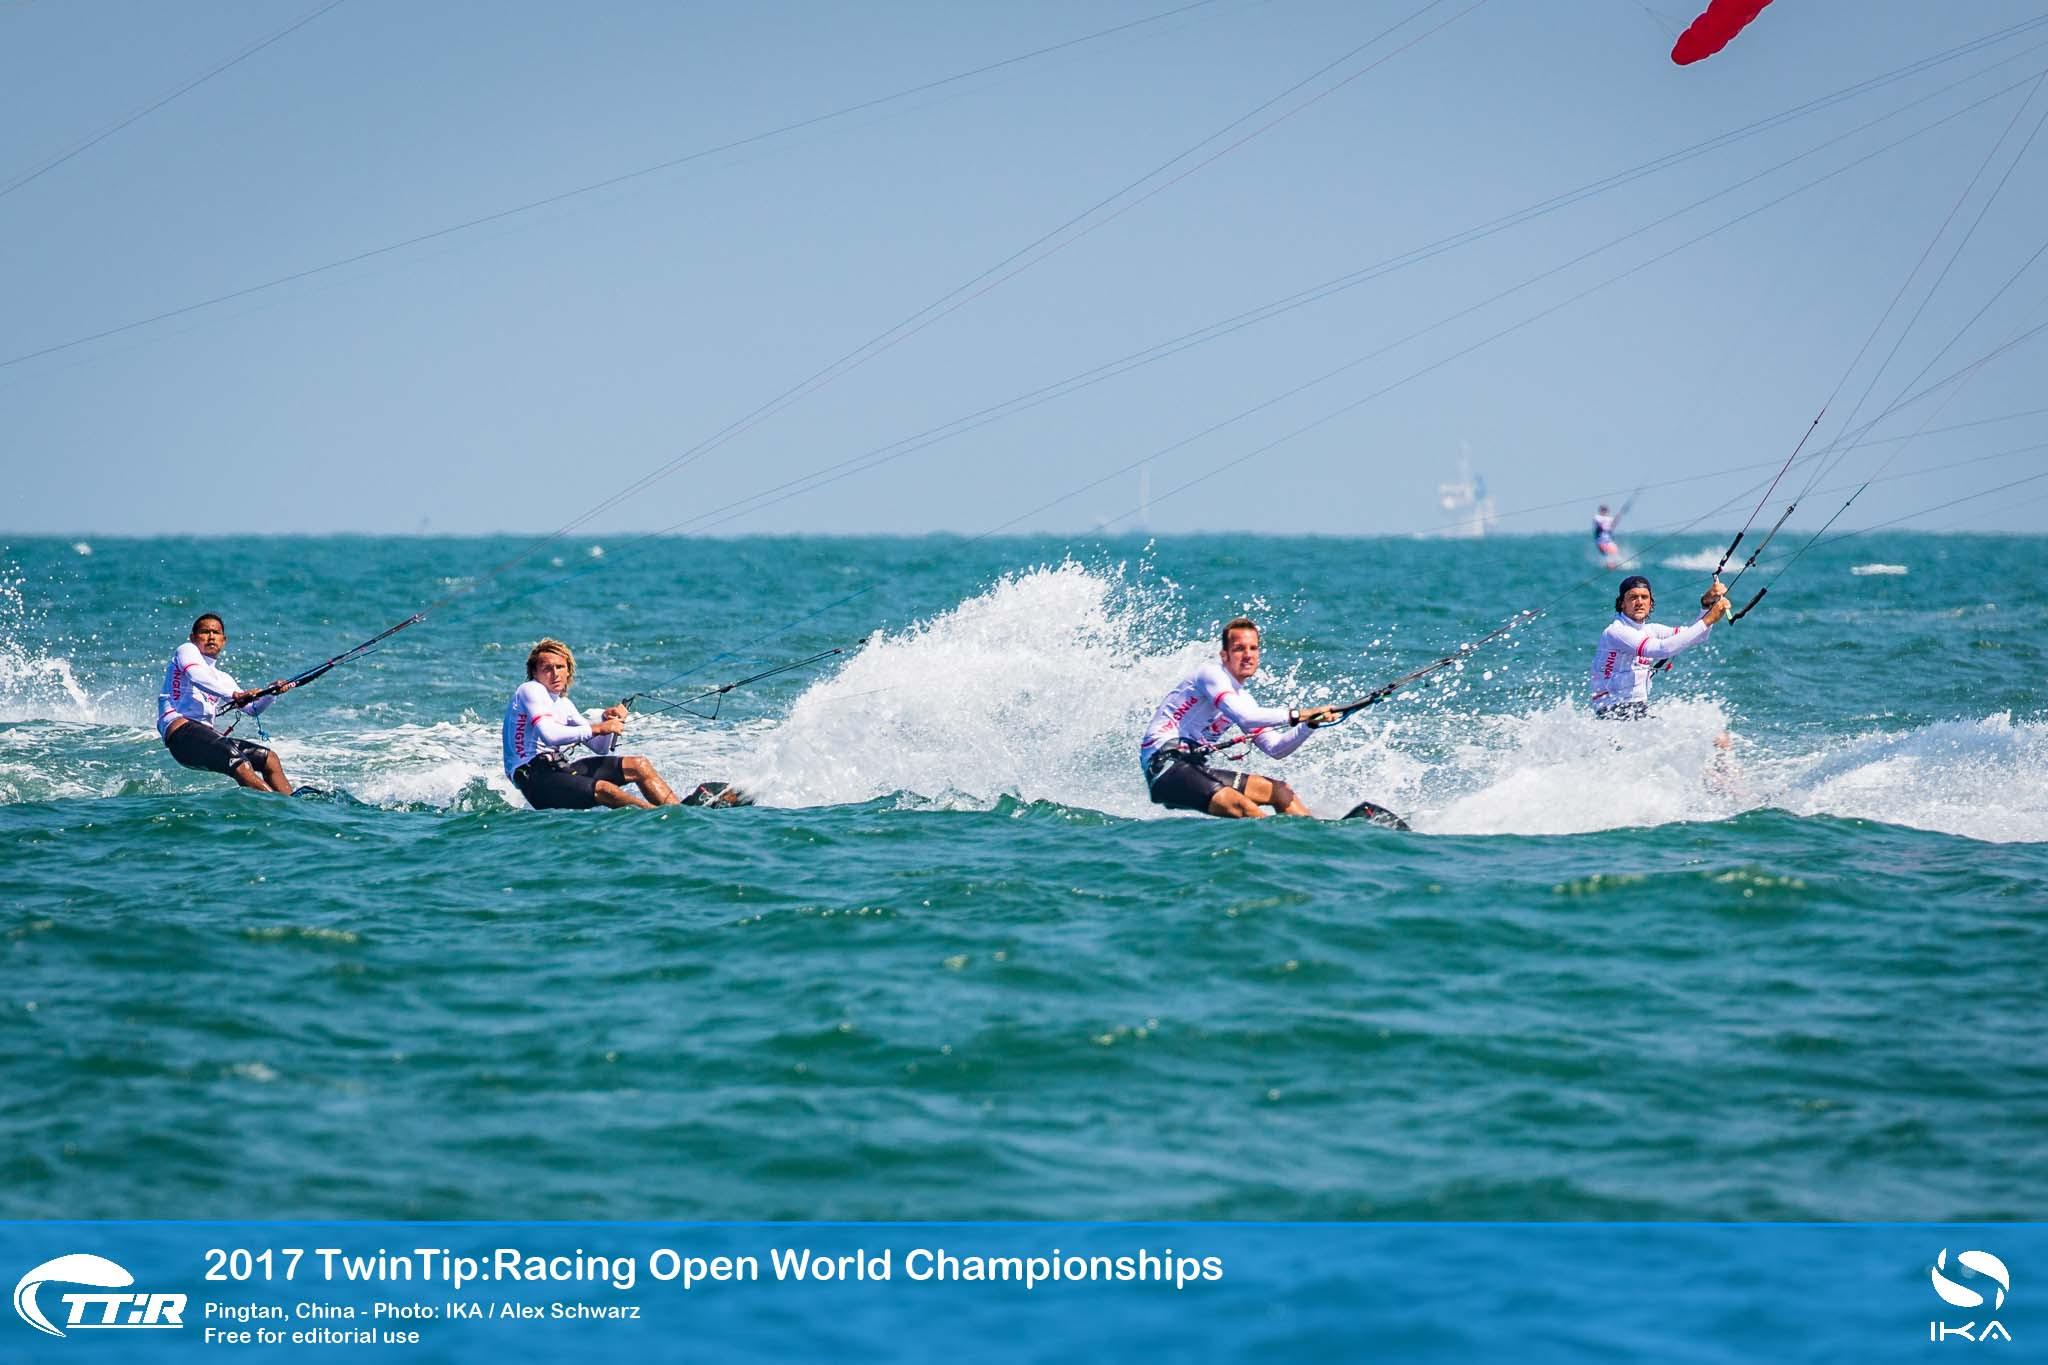 c9116f44 8ec6 4782 80d4 49496c0a8bbf - Twin Tip Racing World Championships